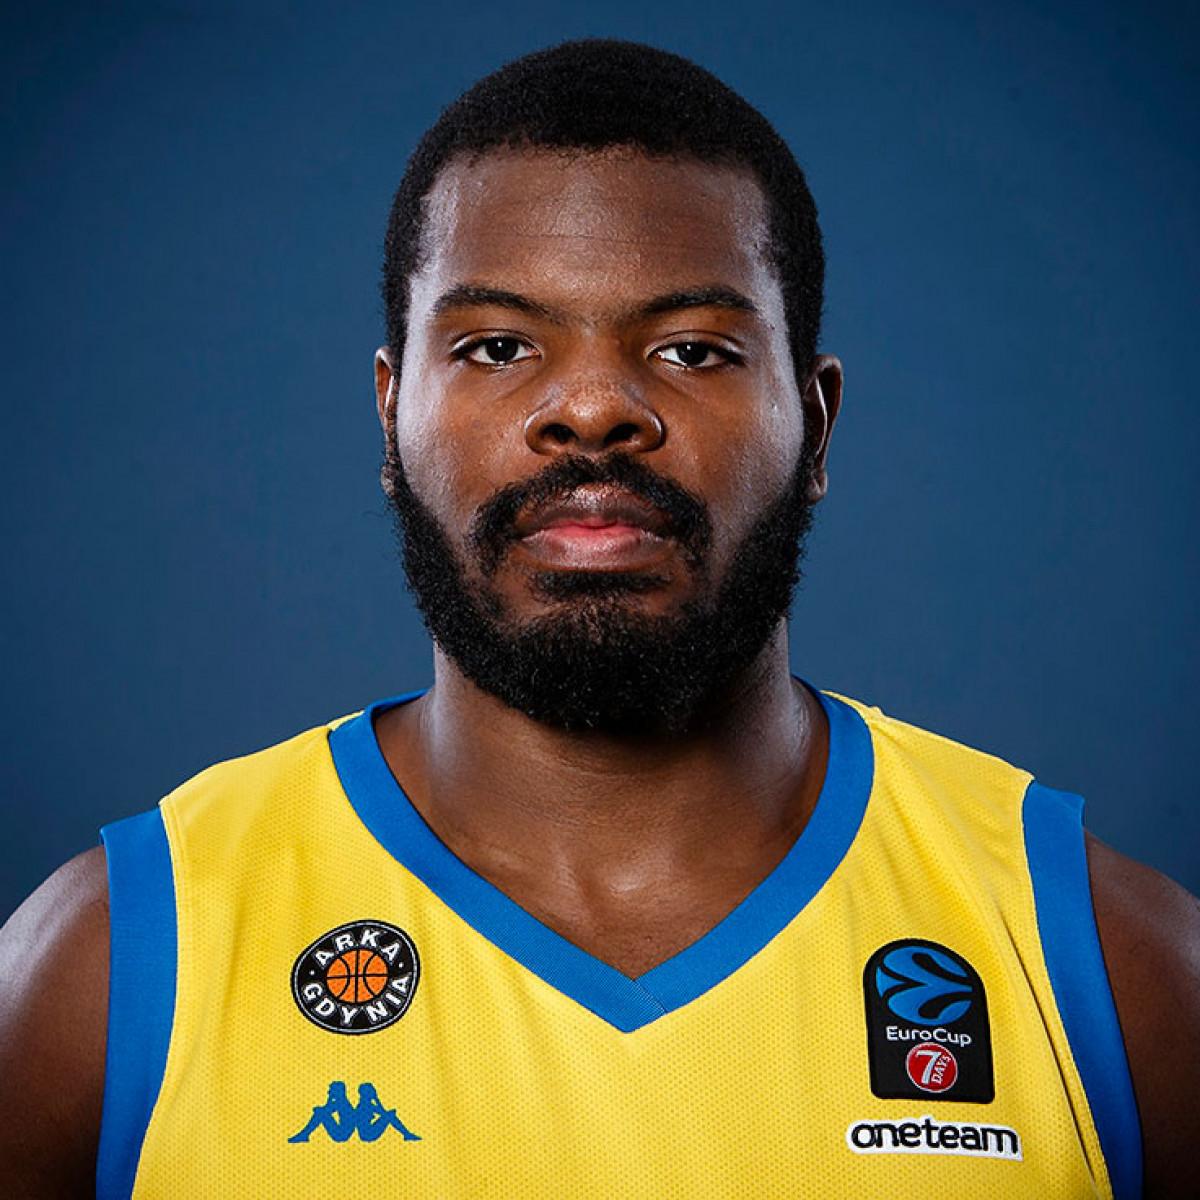 Photo of Ben Emelogu, 2019-2020 season